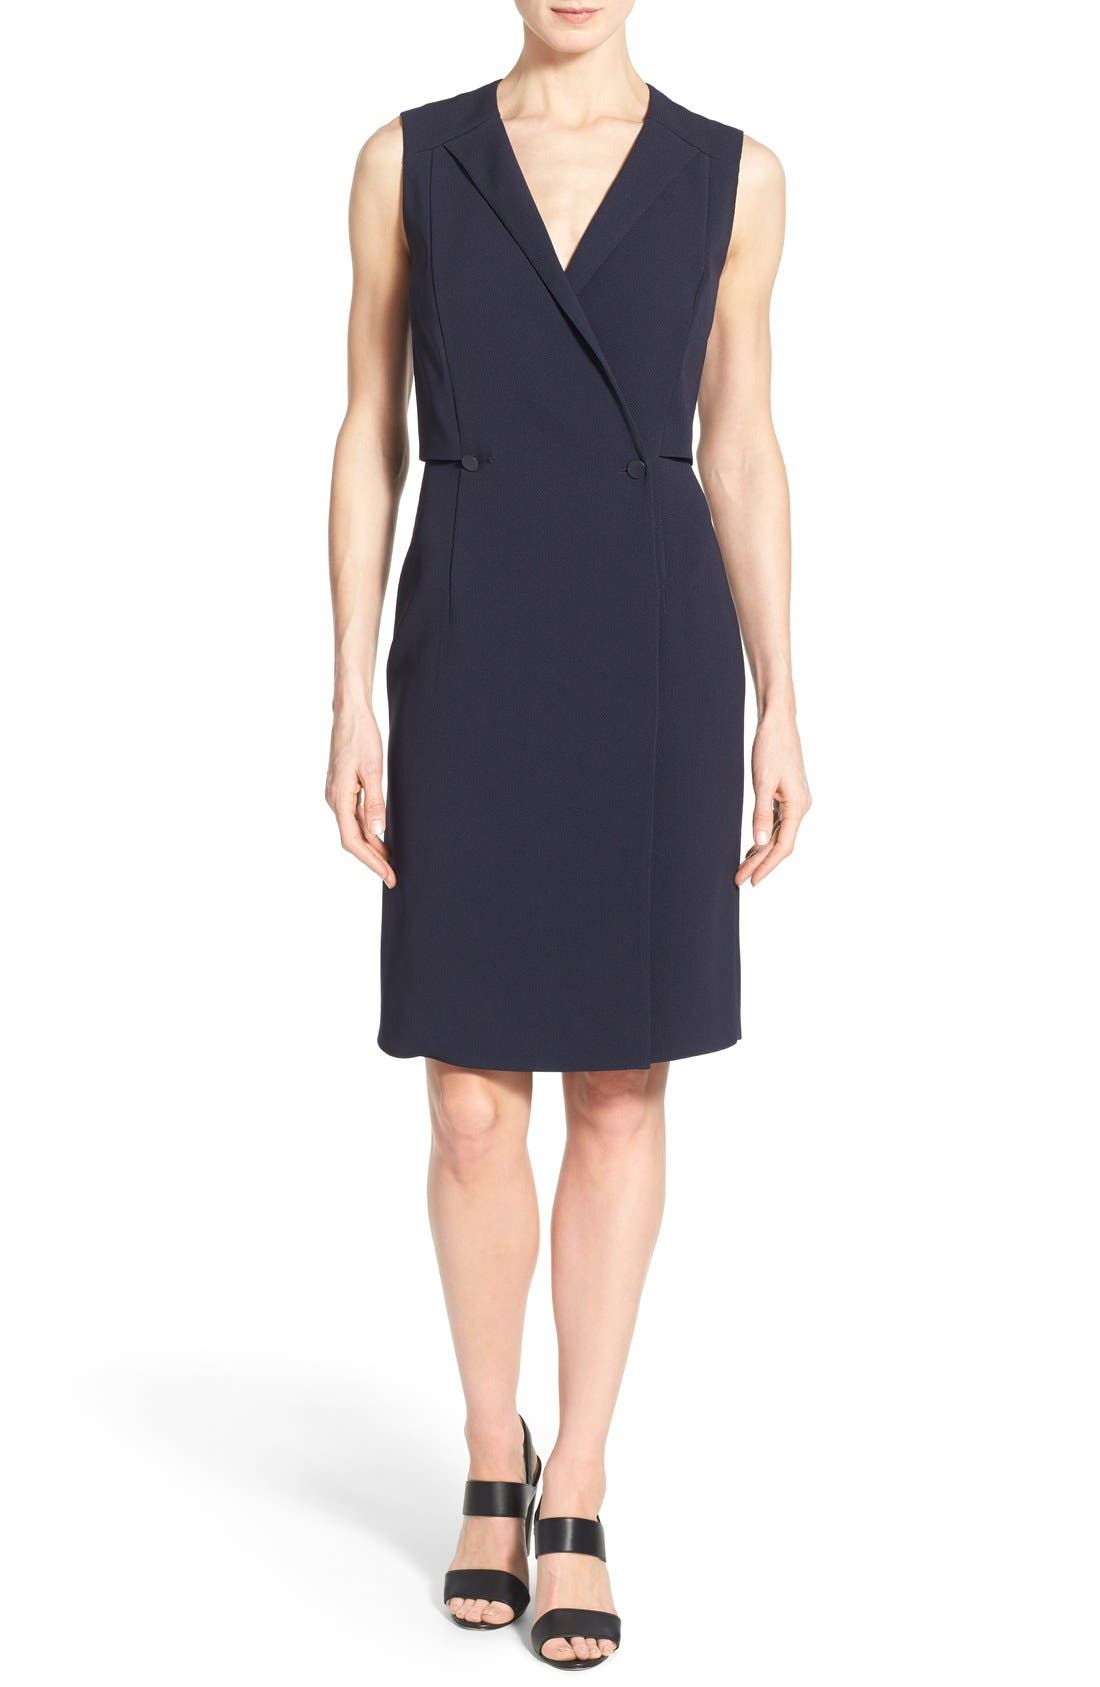 'Damarine' V-Neck Sleeveless Tuxedo Dress,                             Main thumbnail 1, color,                             411